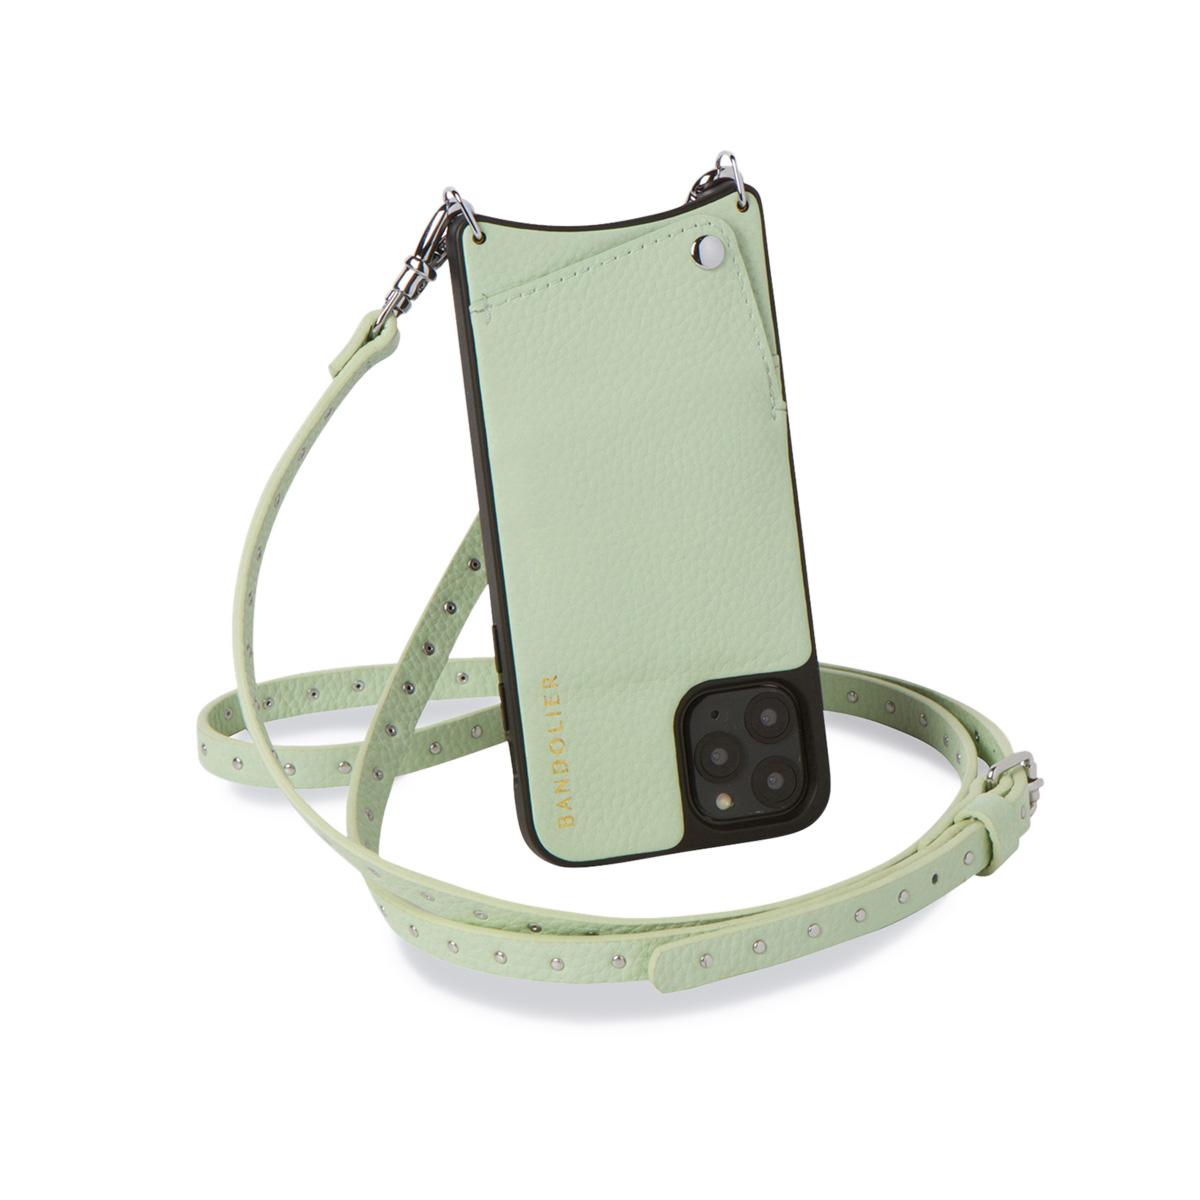 BANDOLIER NICOLE MIST GREEN バンドリヤー iPhoneXS X ケース スマホ 携帯 ショルダー アイフォン ニコル メンズ レディース レザー グリーン 10NIC